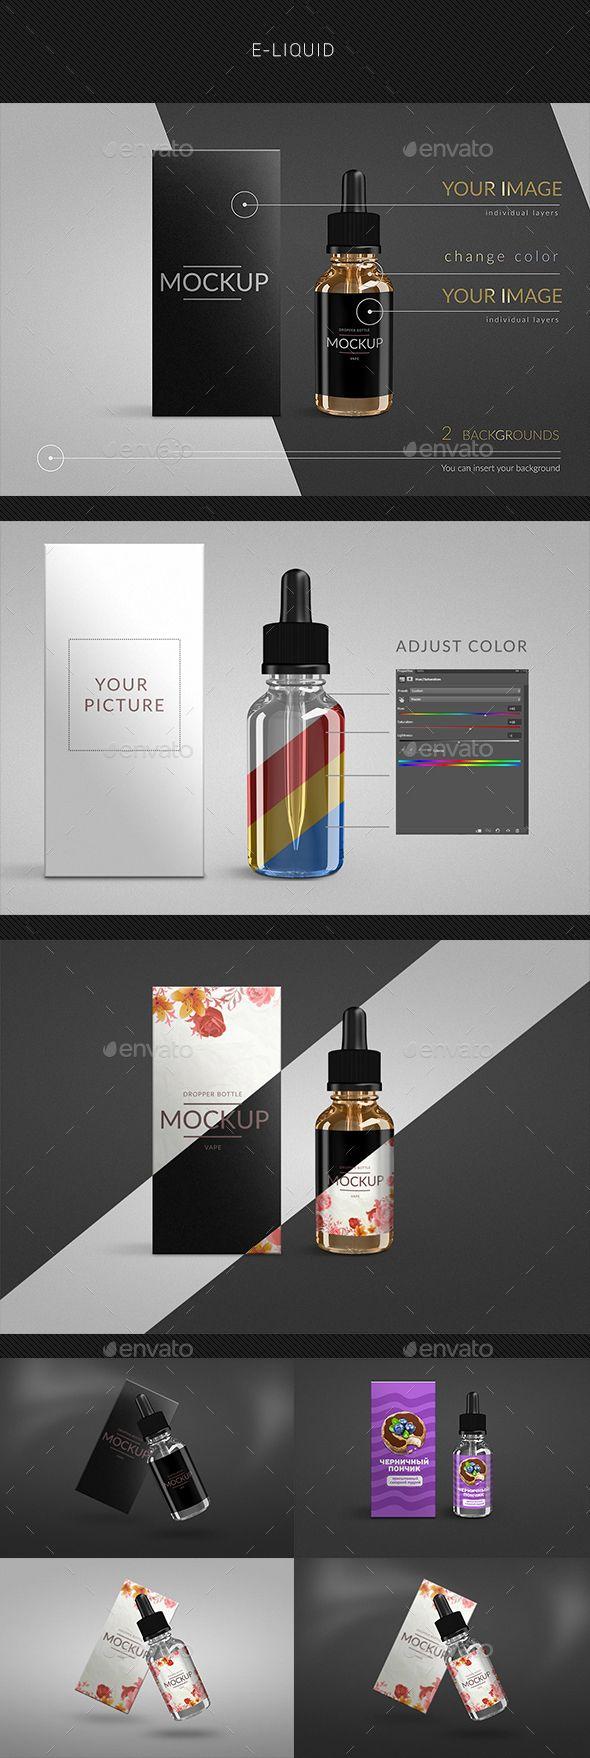 Vape smoking Liquid Bottle E-liquid - Product Mock-Ups Graphics